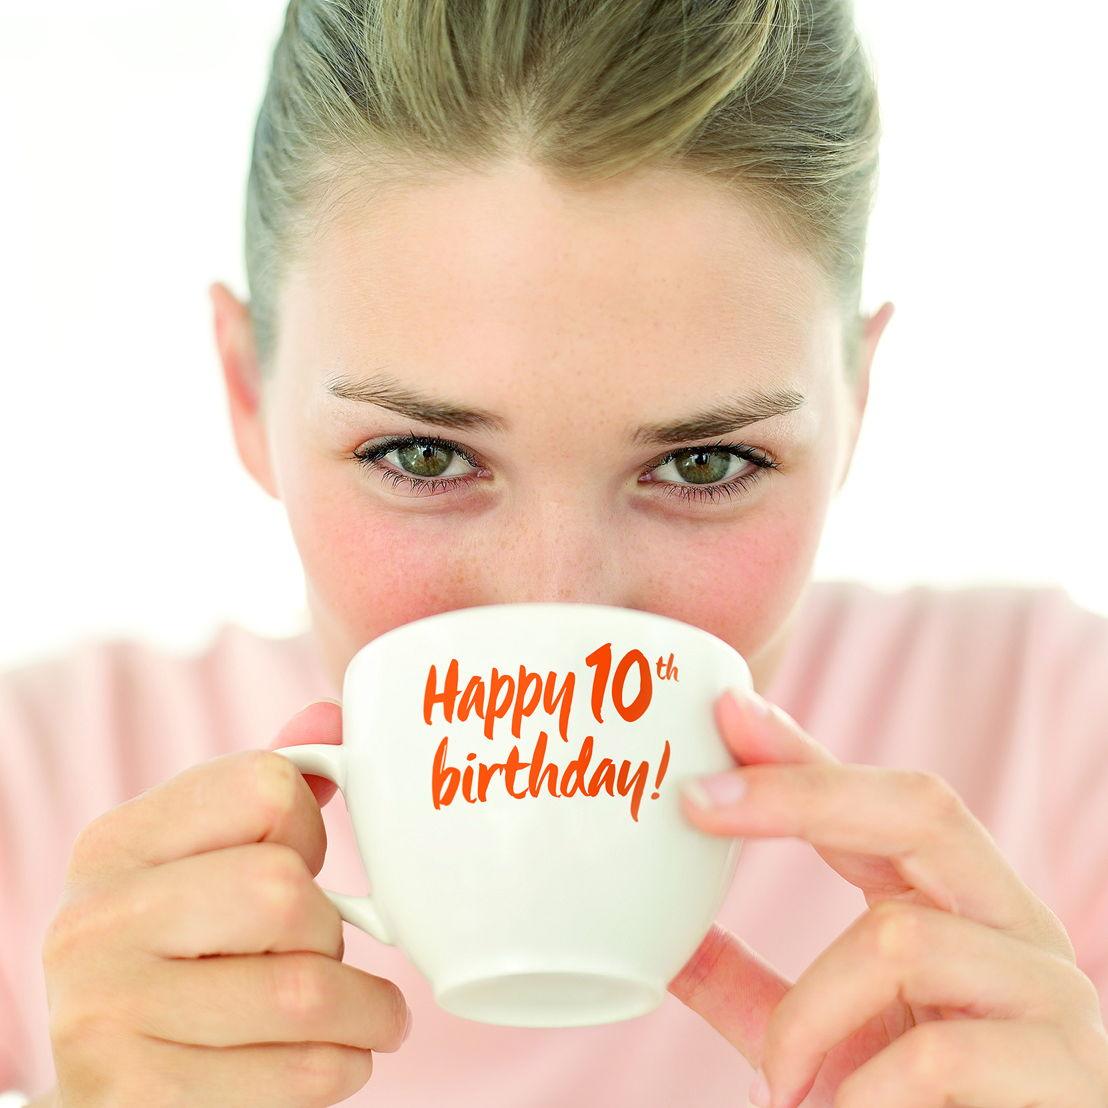 Happy 10th birthday!